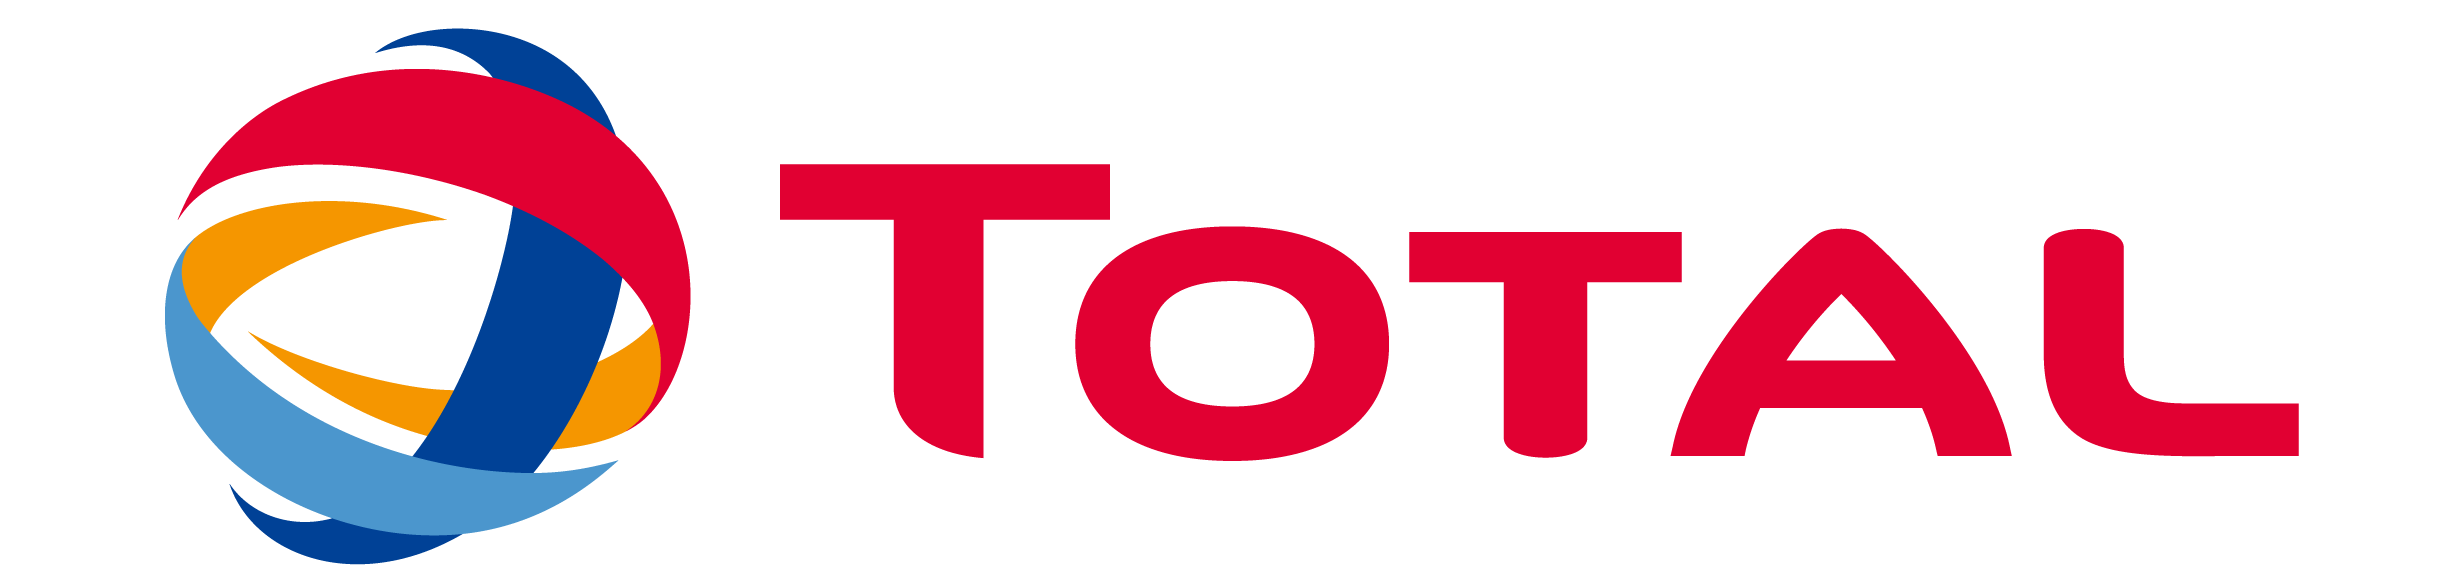 total-petrochemicals-refining-jobs-ehscareers-14crop